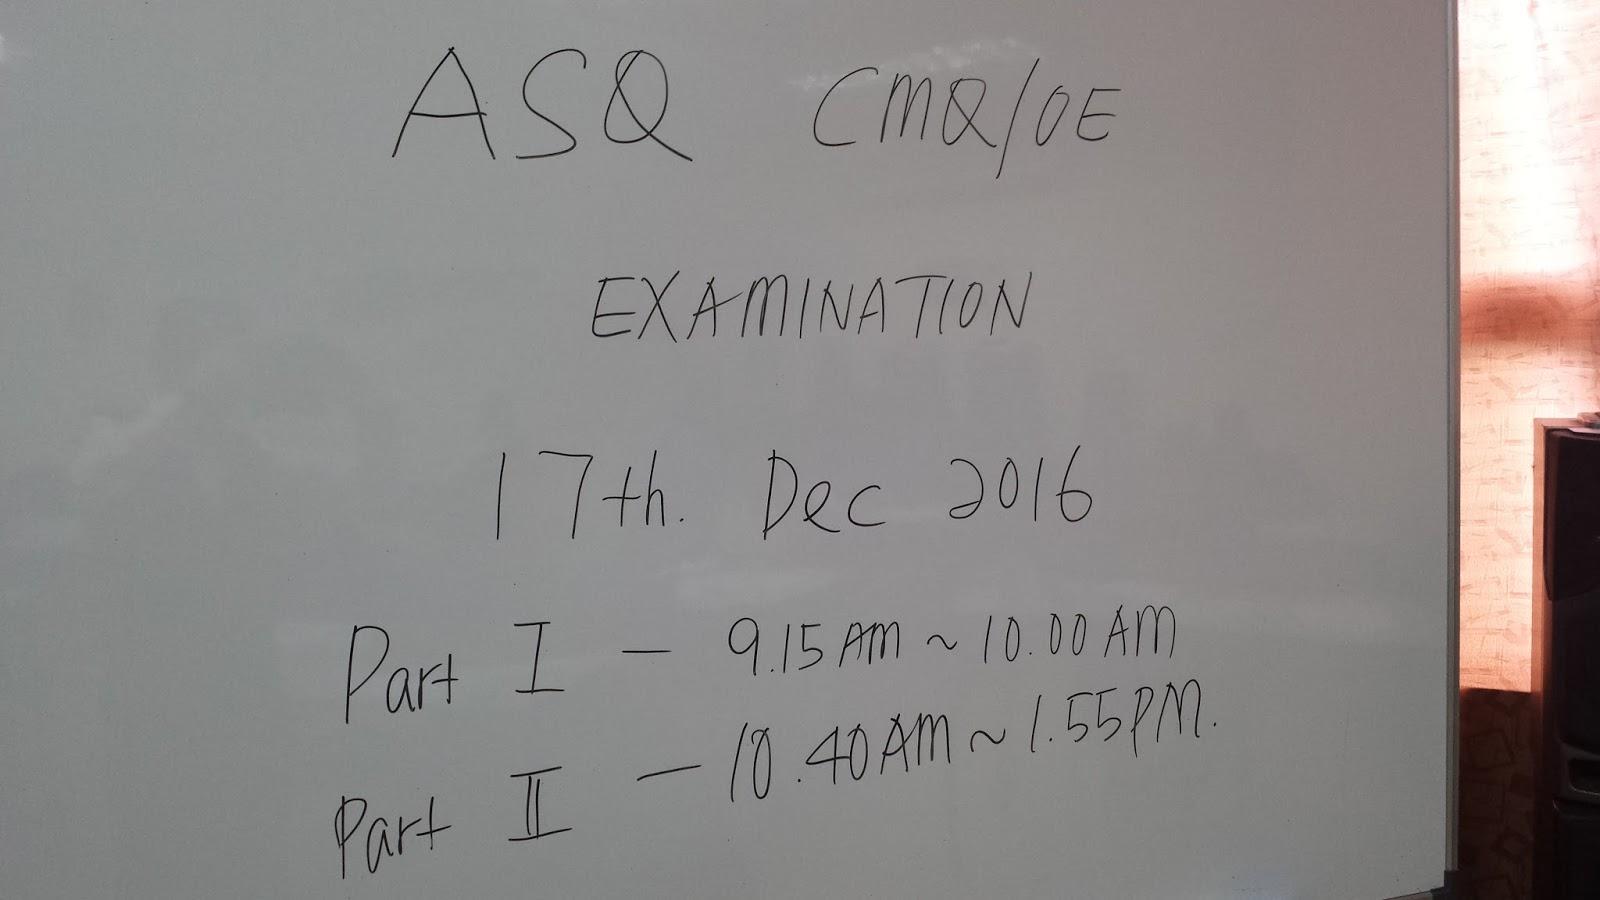 Malaysia cmqoe certified manager of qualityorganizational asq certified manager of qualityorganizational excellence cmqoe negeri sembilan intake internal examination on 17th dec 2016 xflitez Choice Image